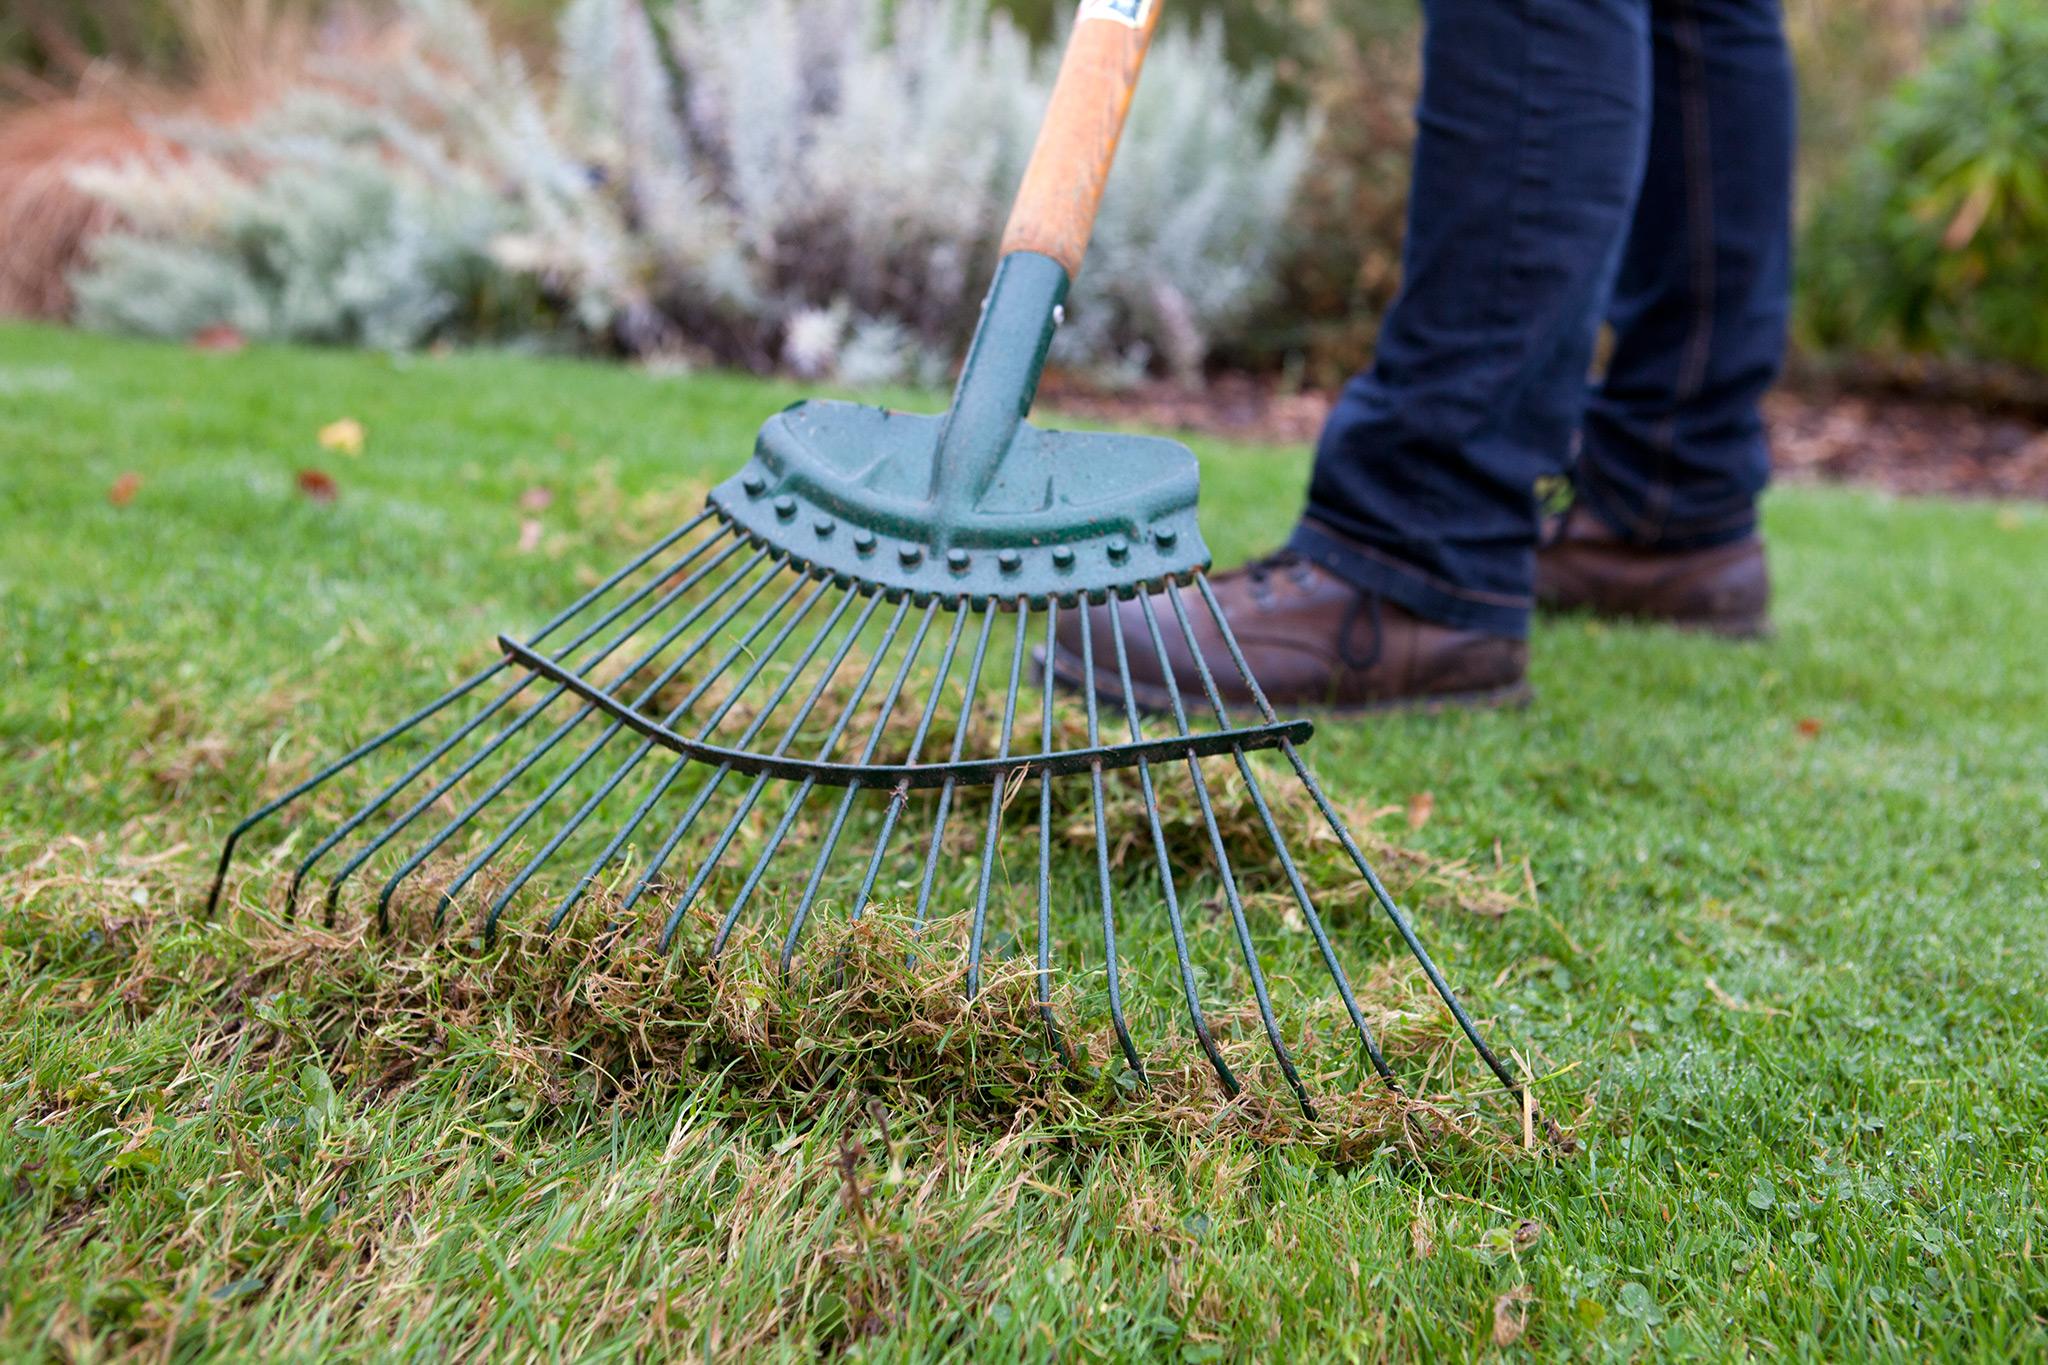 raking-the-lawn-3